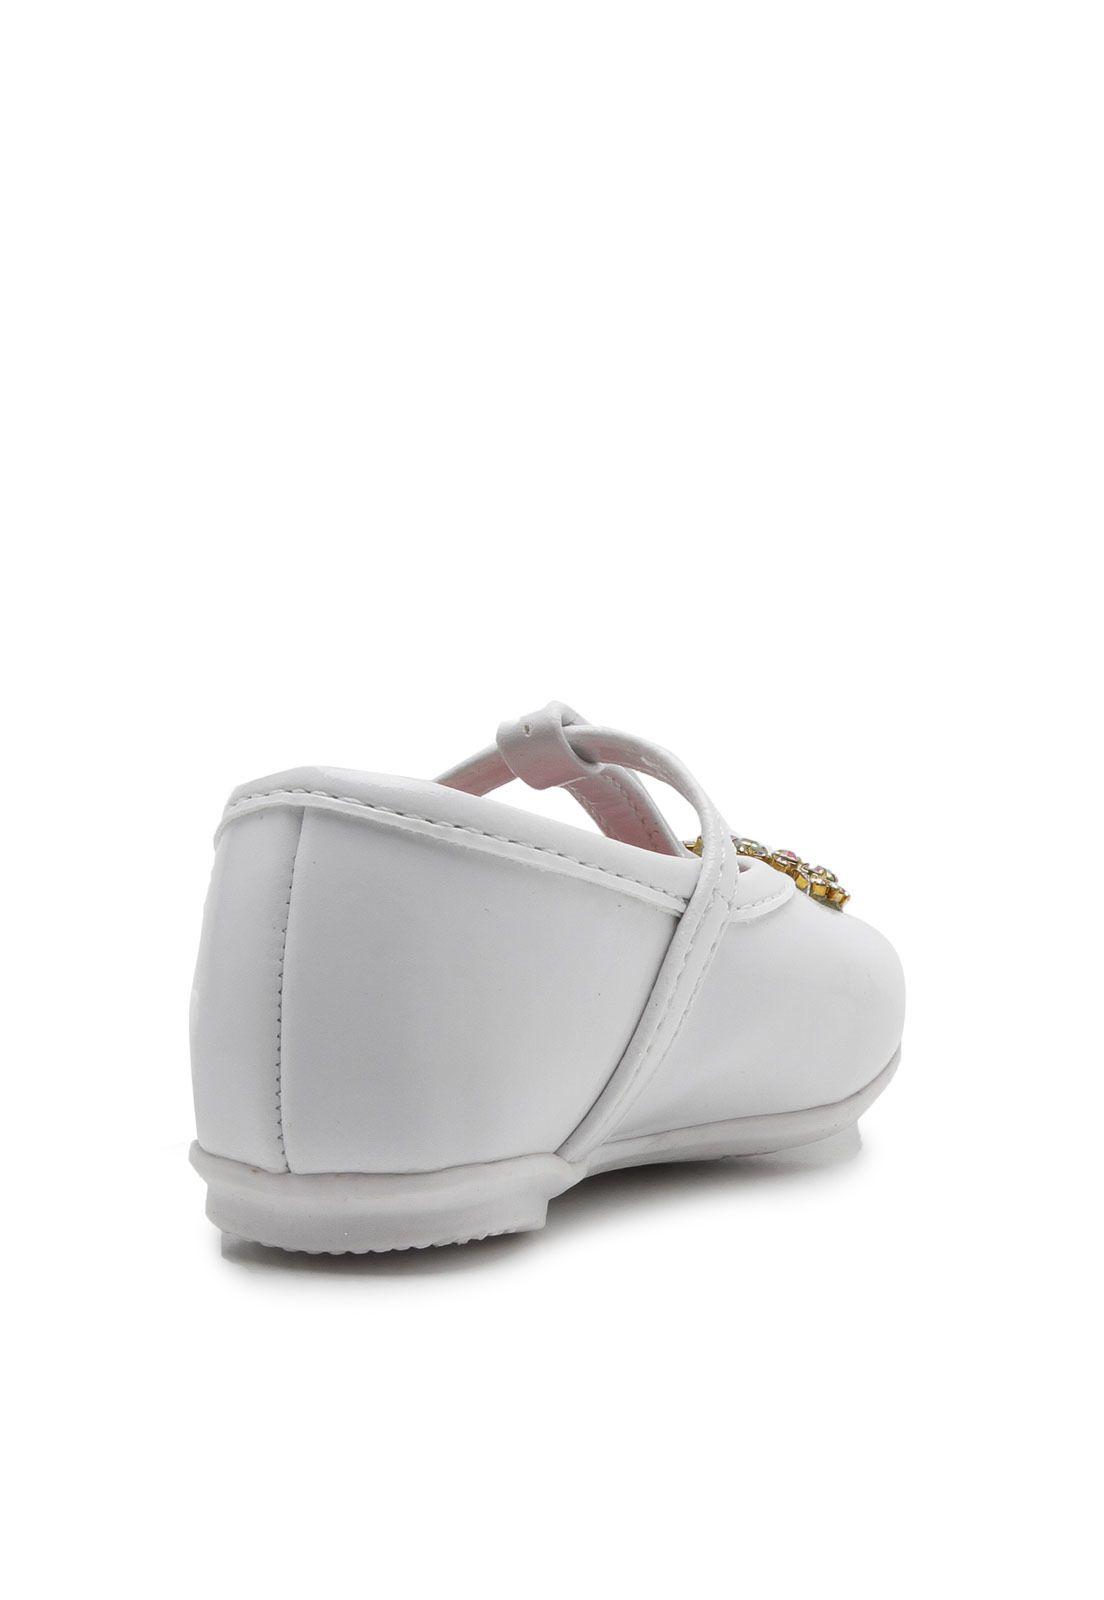 590dc9d6e5 Sapato Feminino Casual Kidy Baby Confortavel Original